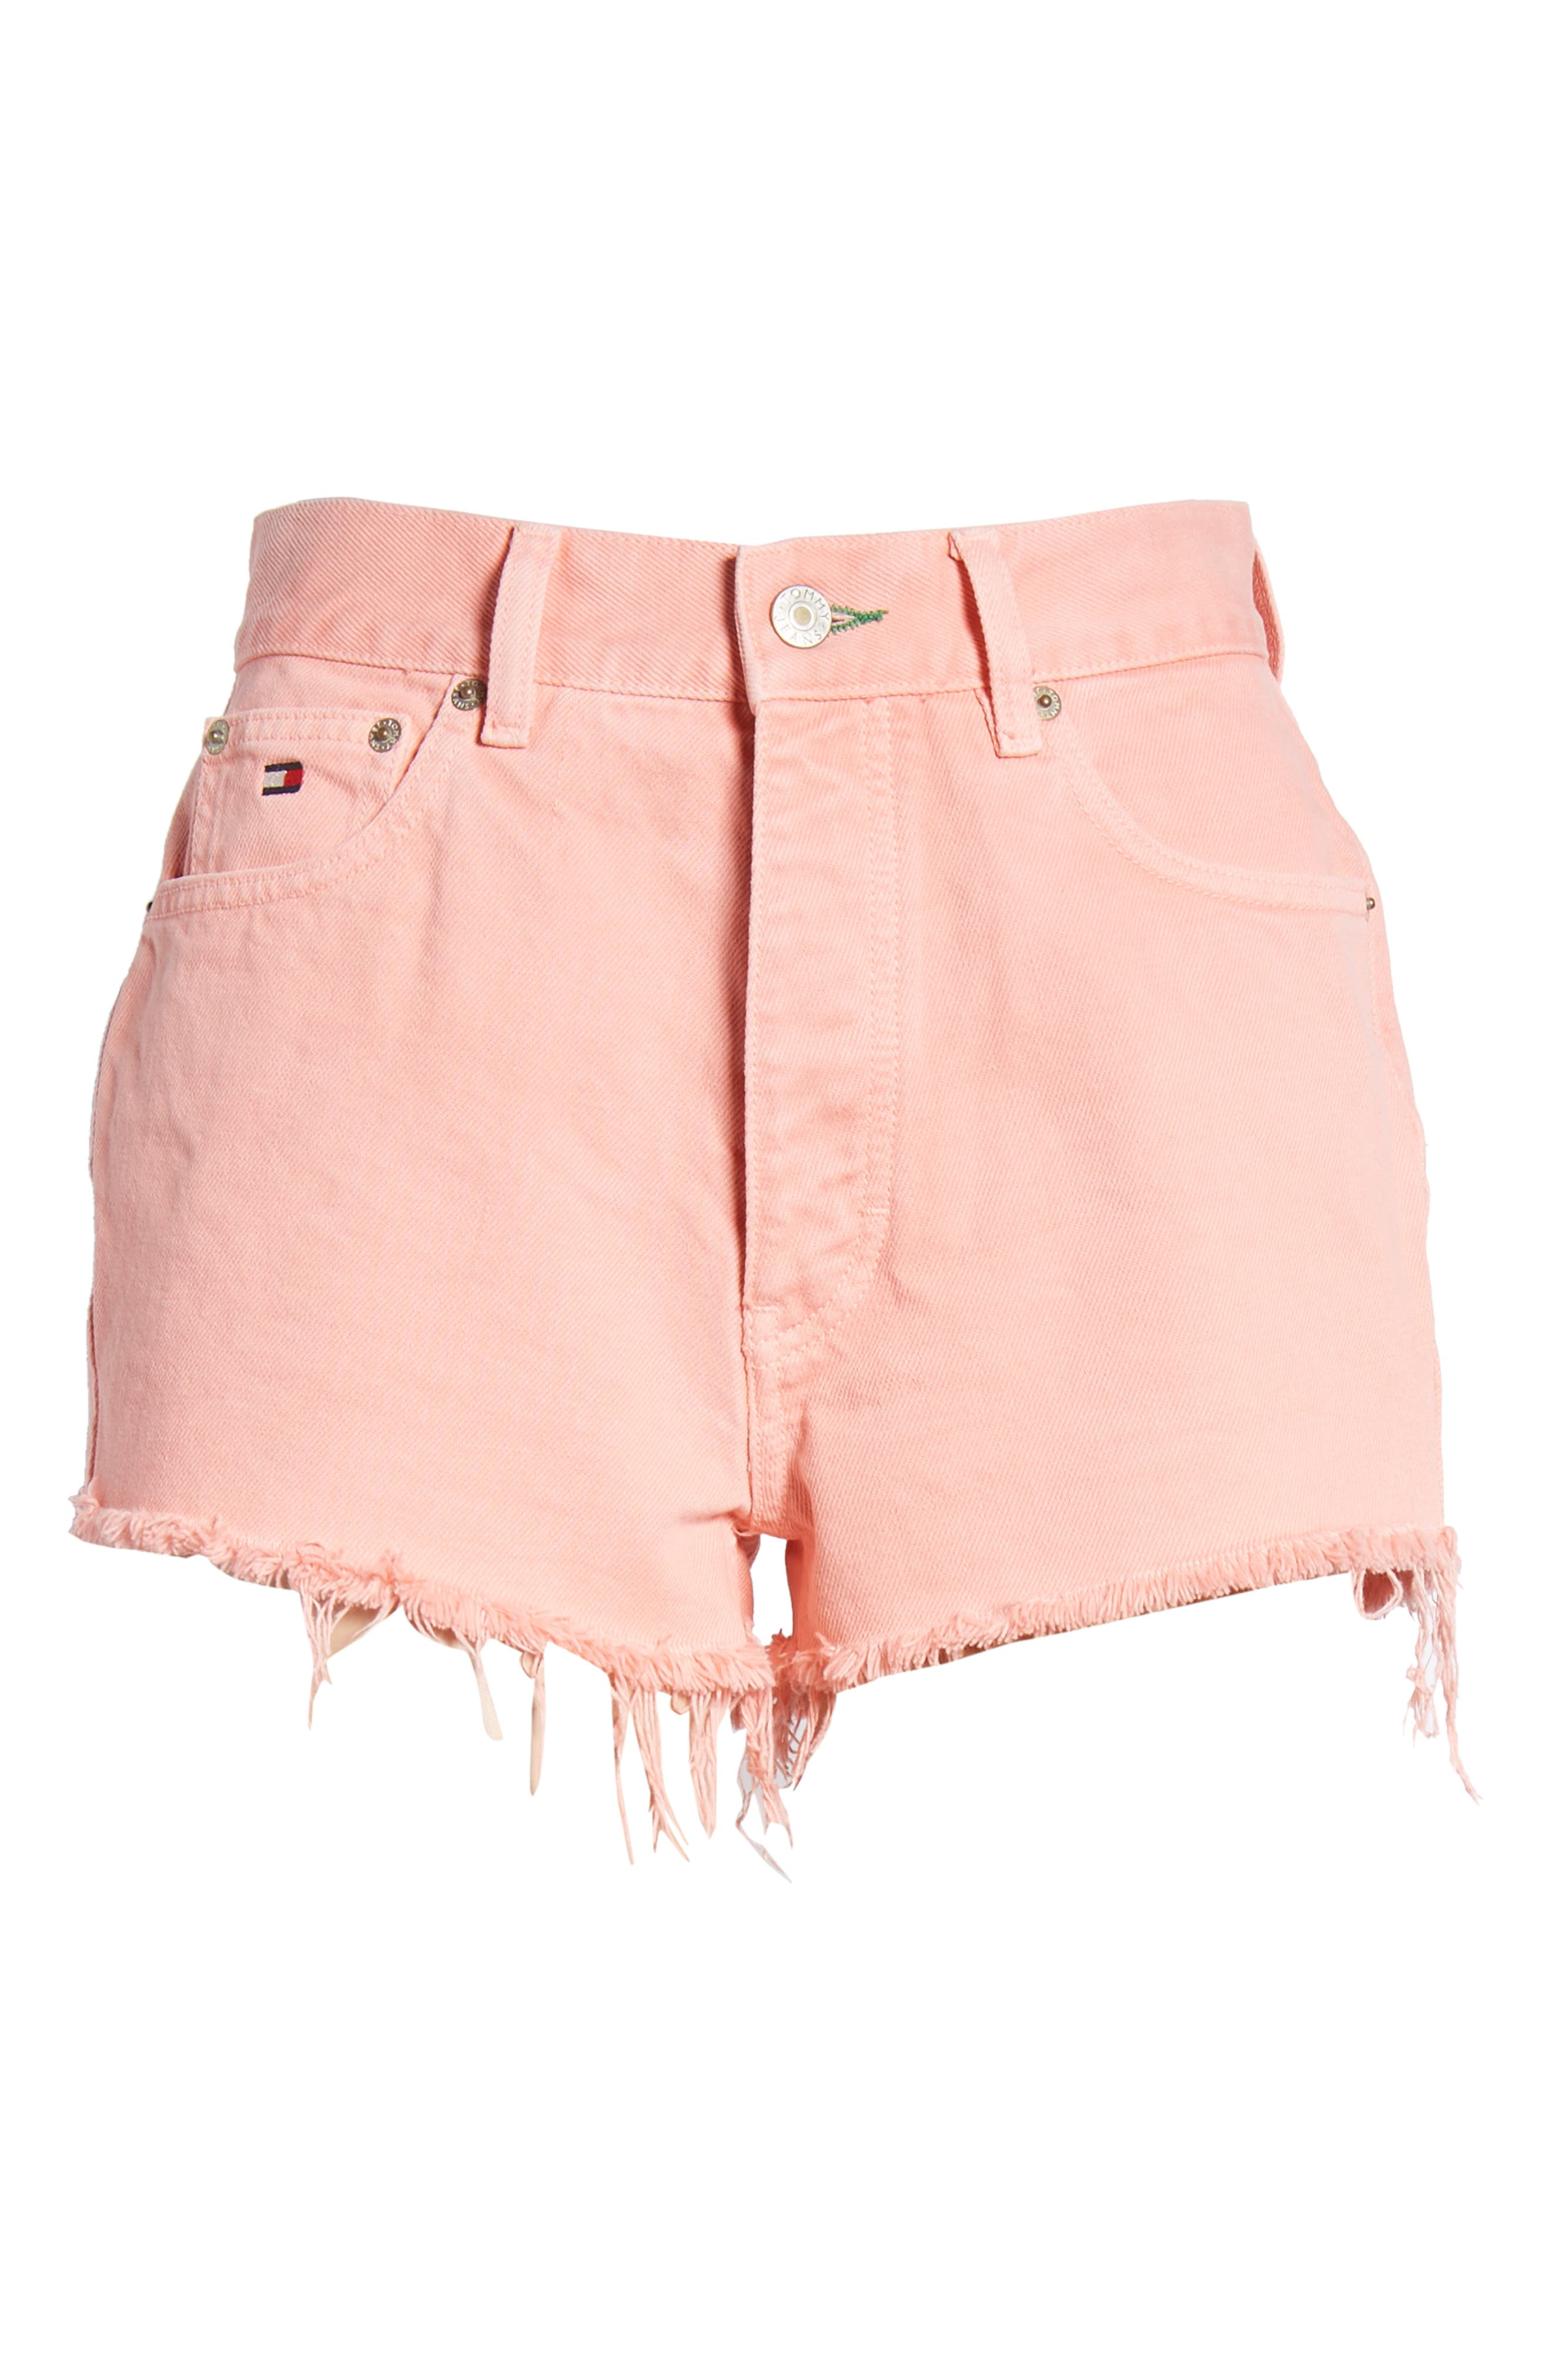 Fray Hem Denim Shorts,                             Alternate thumbnail 7, color,                             Quartz Pink